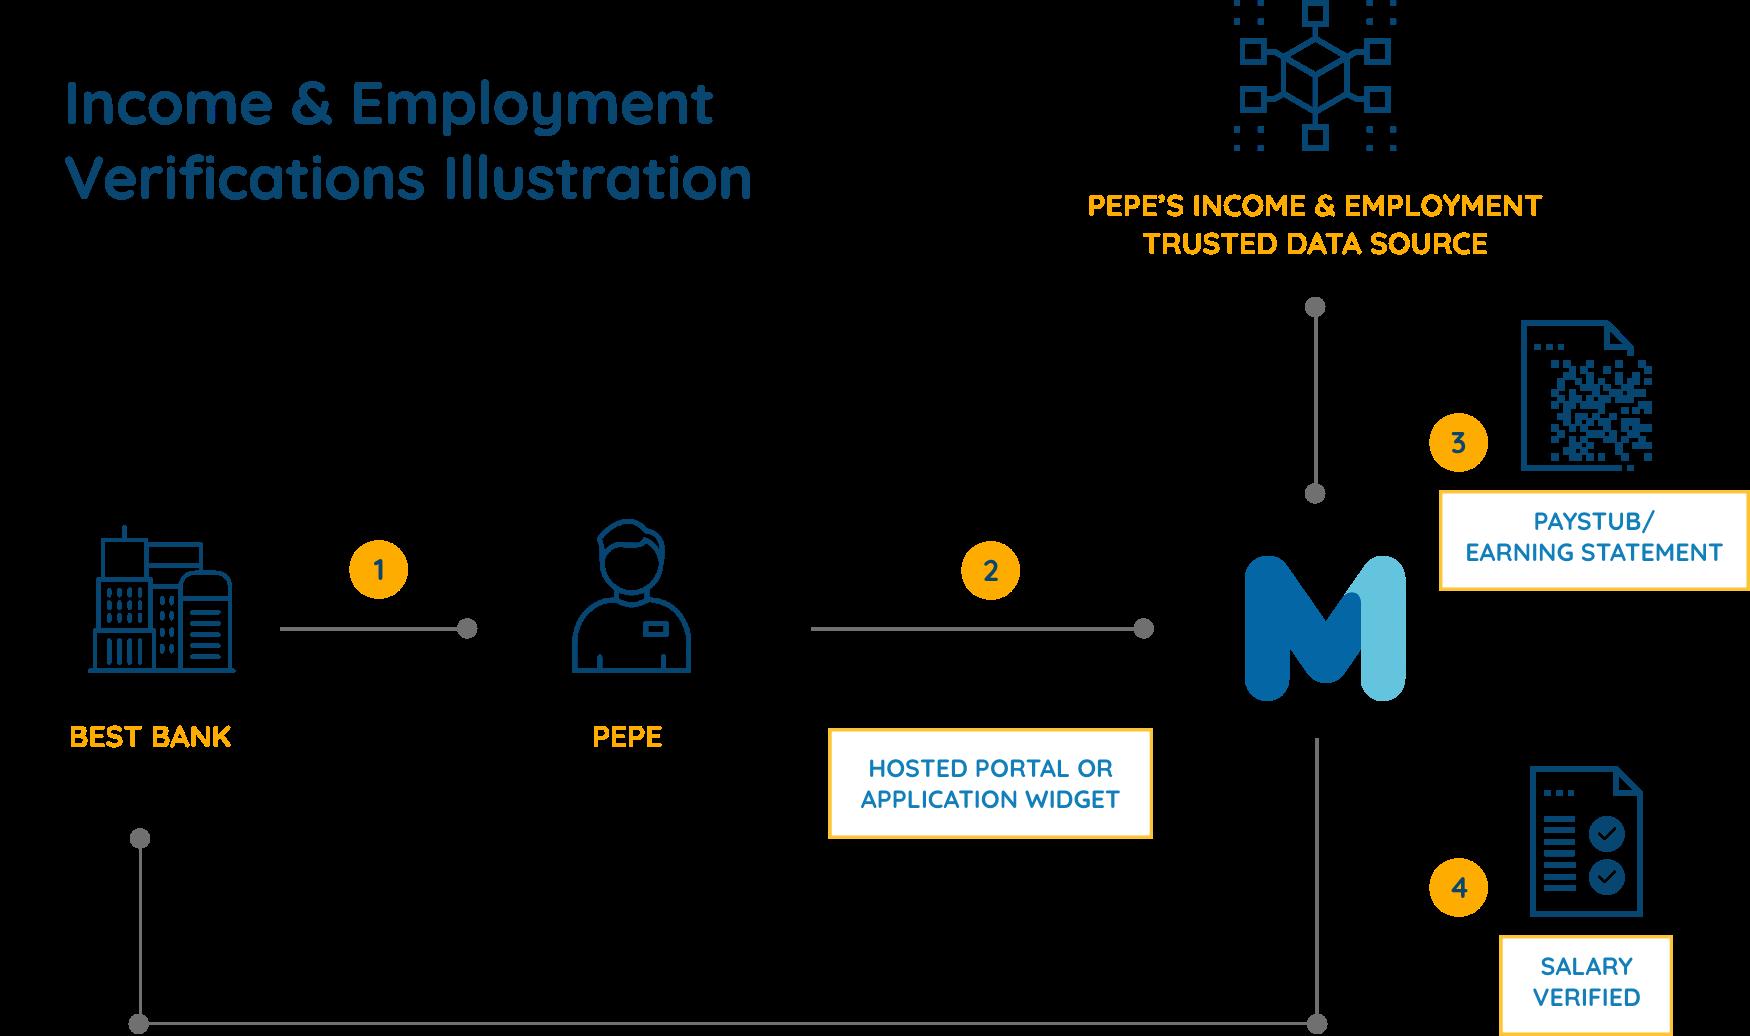 Product income verification flow chart